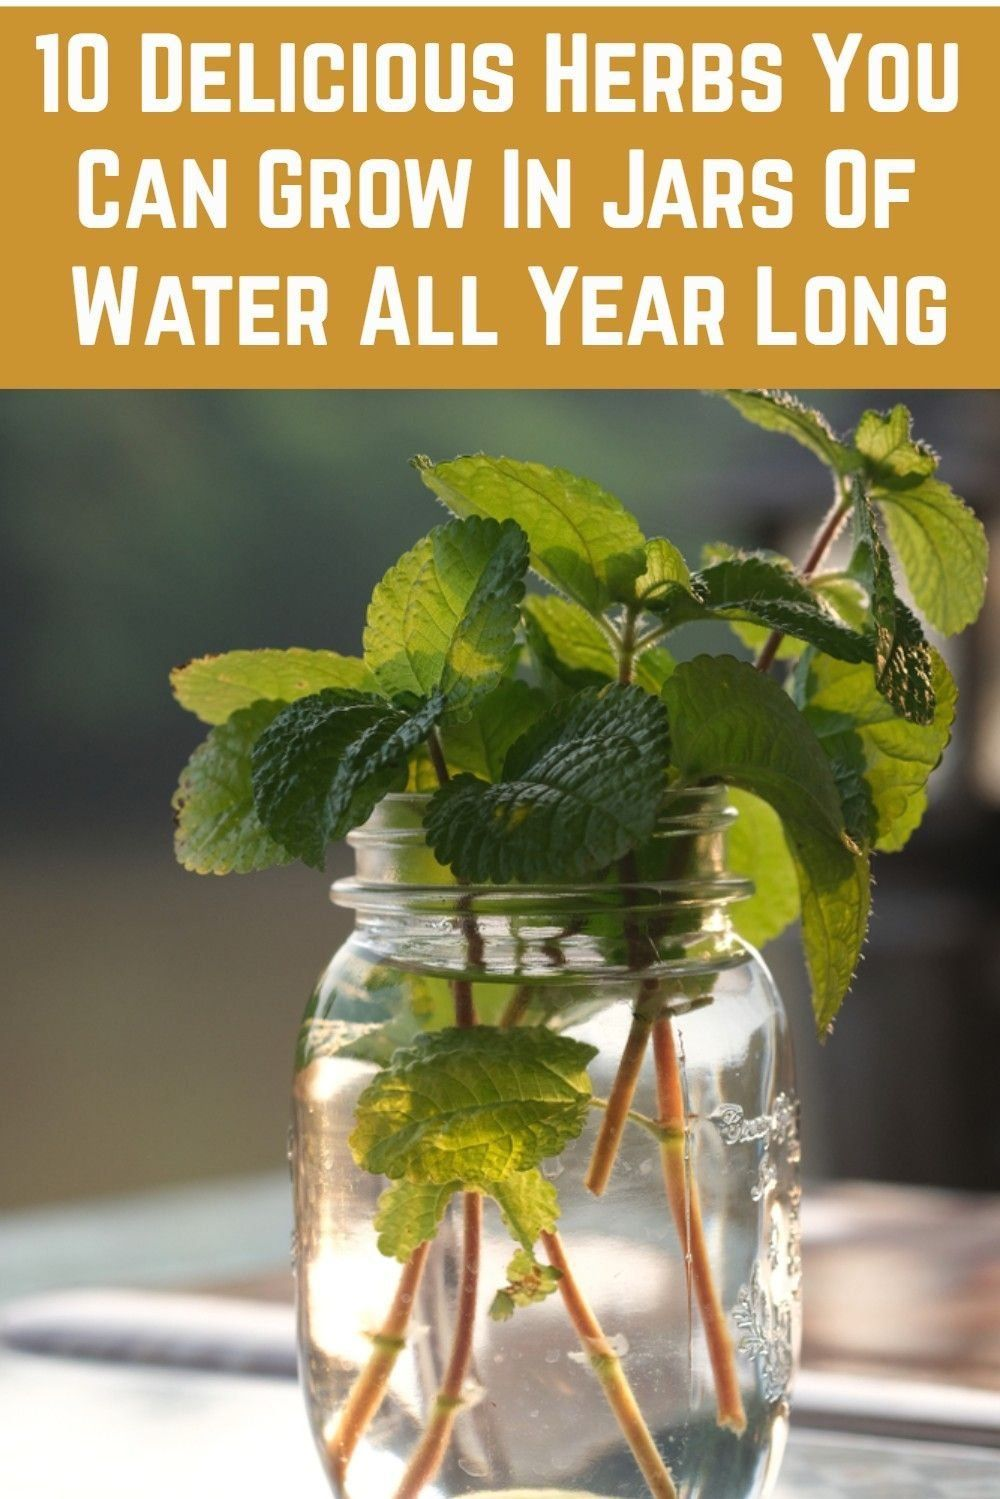 how to grow cilantro indoors water